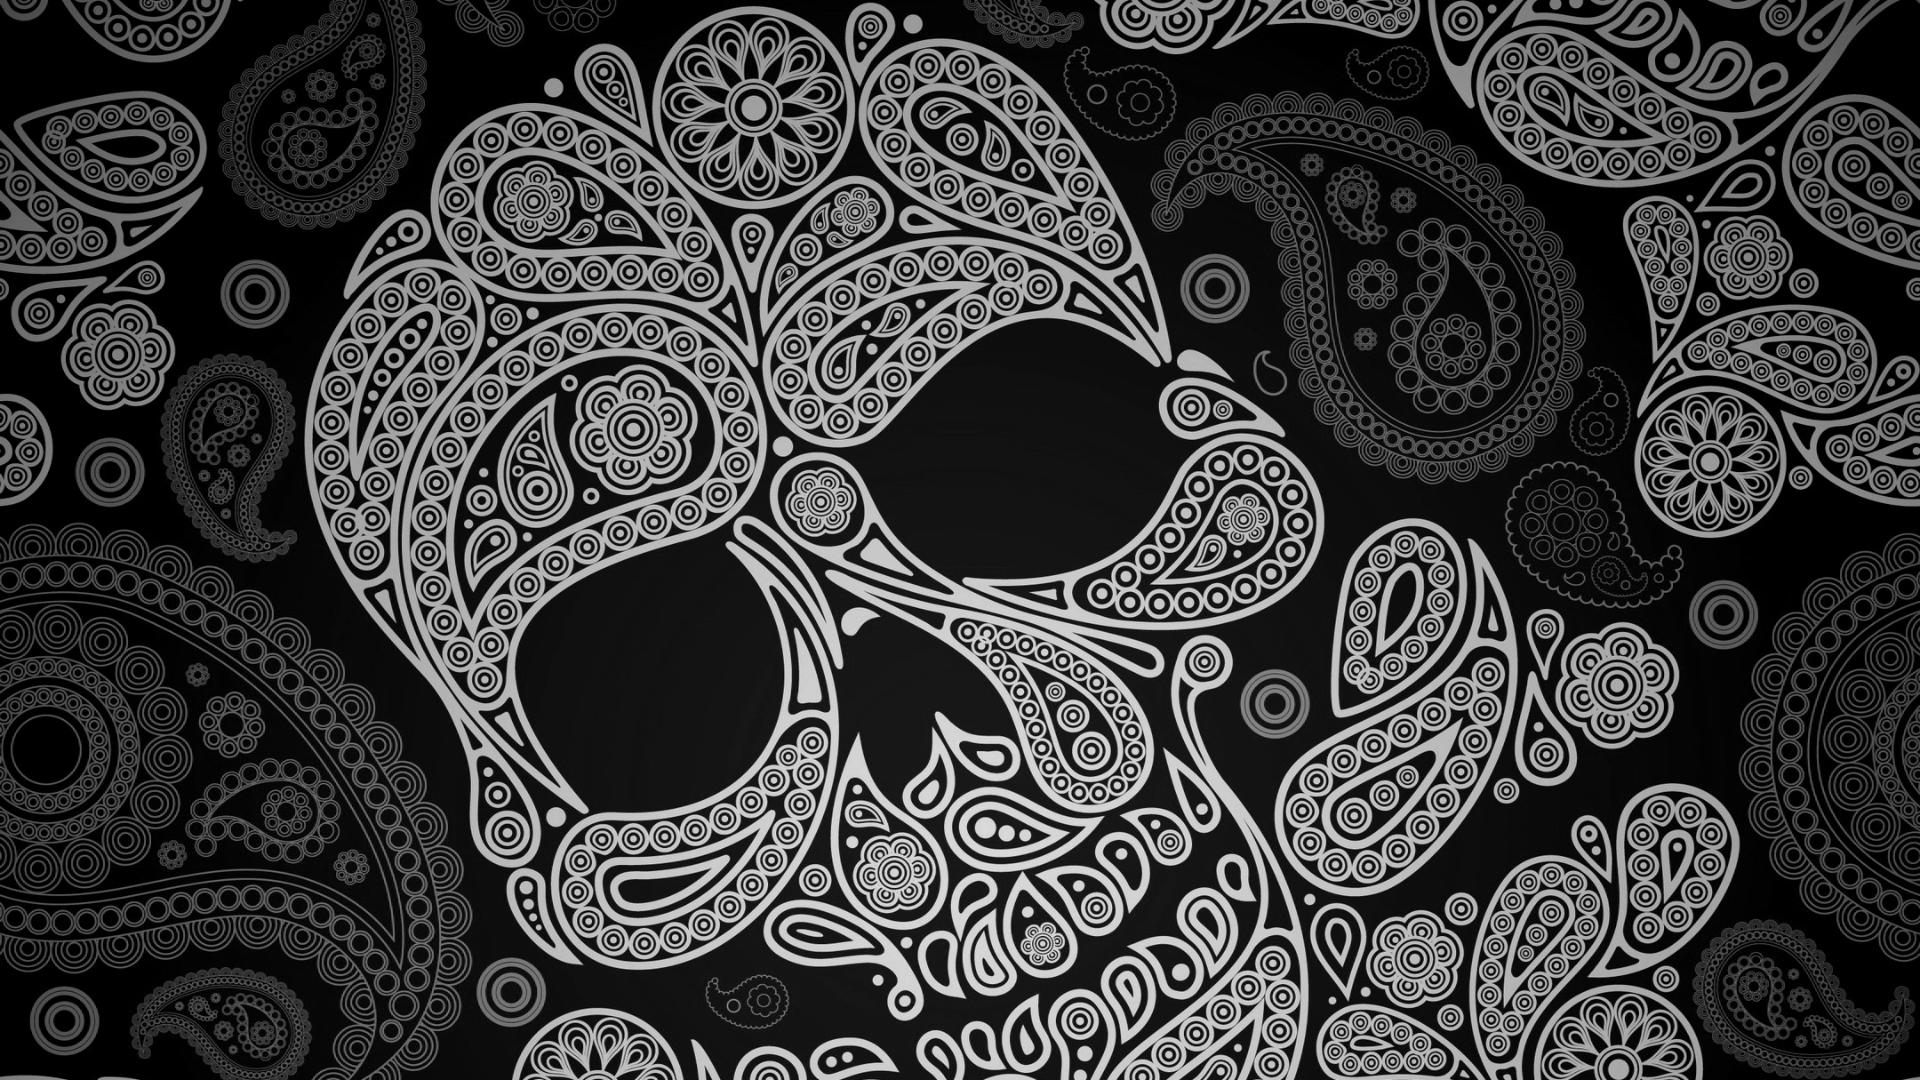 Paisley Skull Nexus 5 Wallpaper 1920x1080 1920x1080